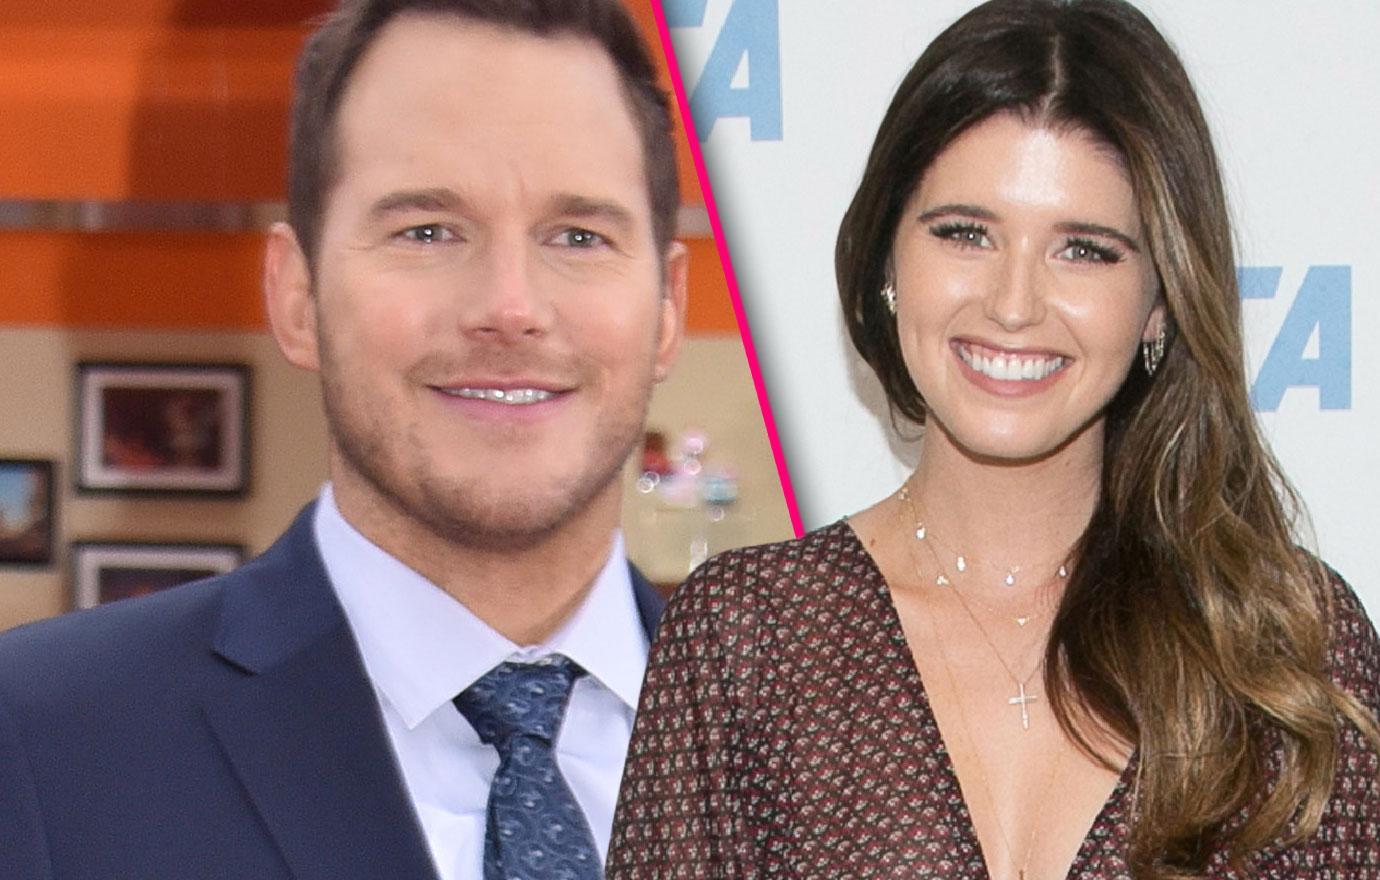 Chris Pratt Wants Winter Themed Wedding With Katherine Schwarzenegger